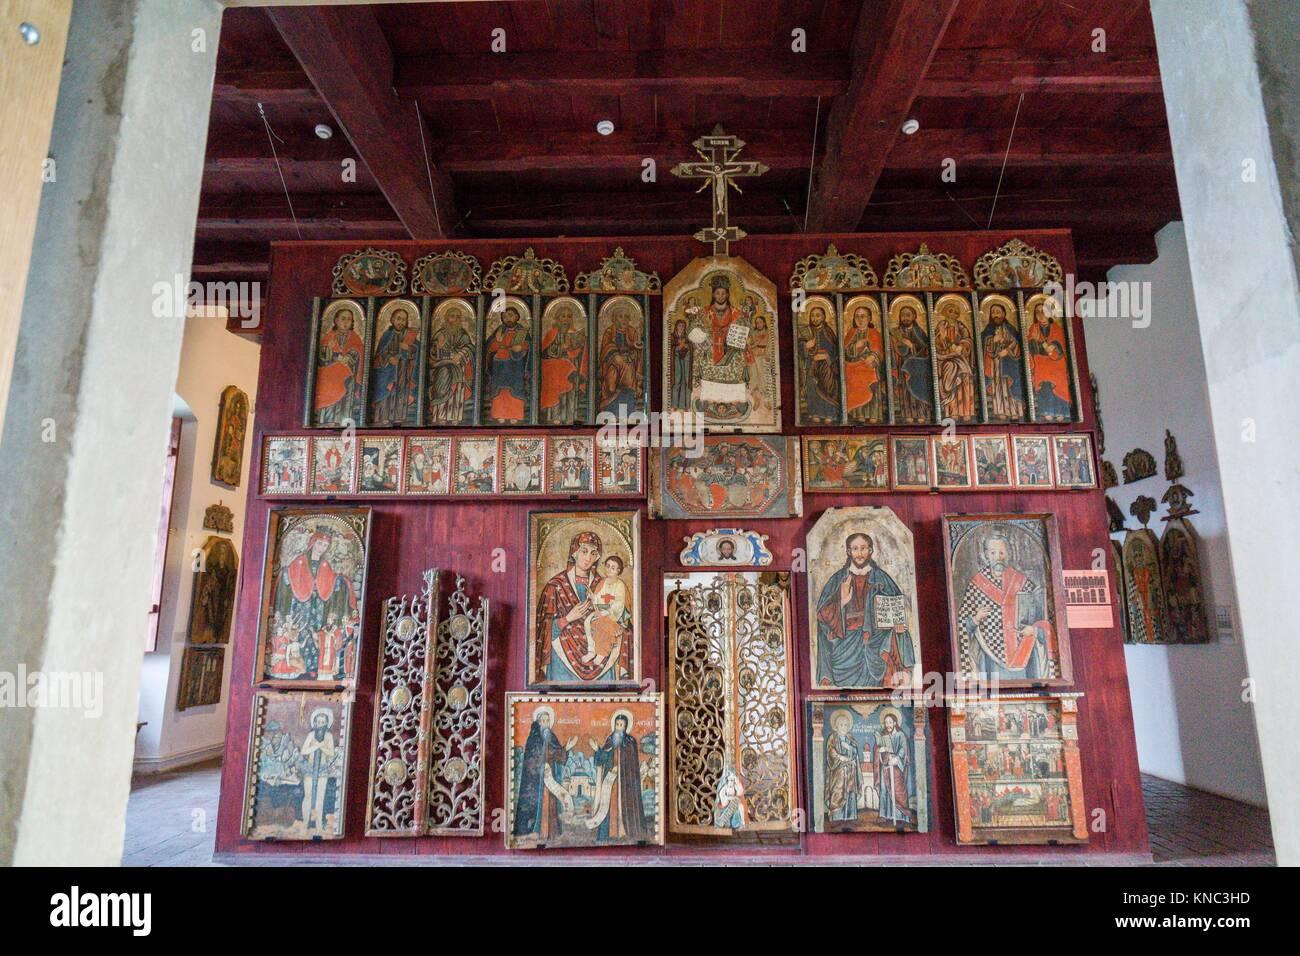 museo de los iconos, castillo Real, Sanok, Podkarpackie Voivodeship, Poland, Eastern Europe Stock Photo